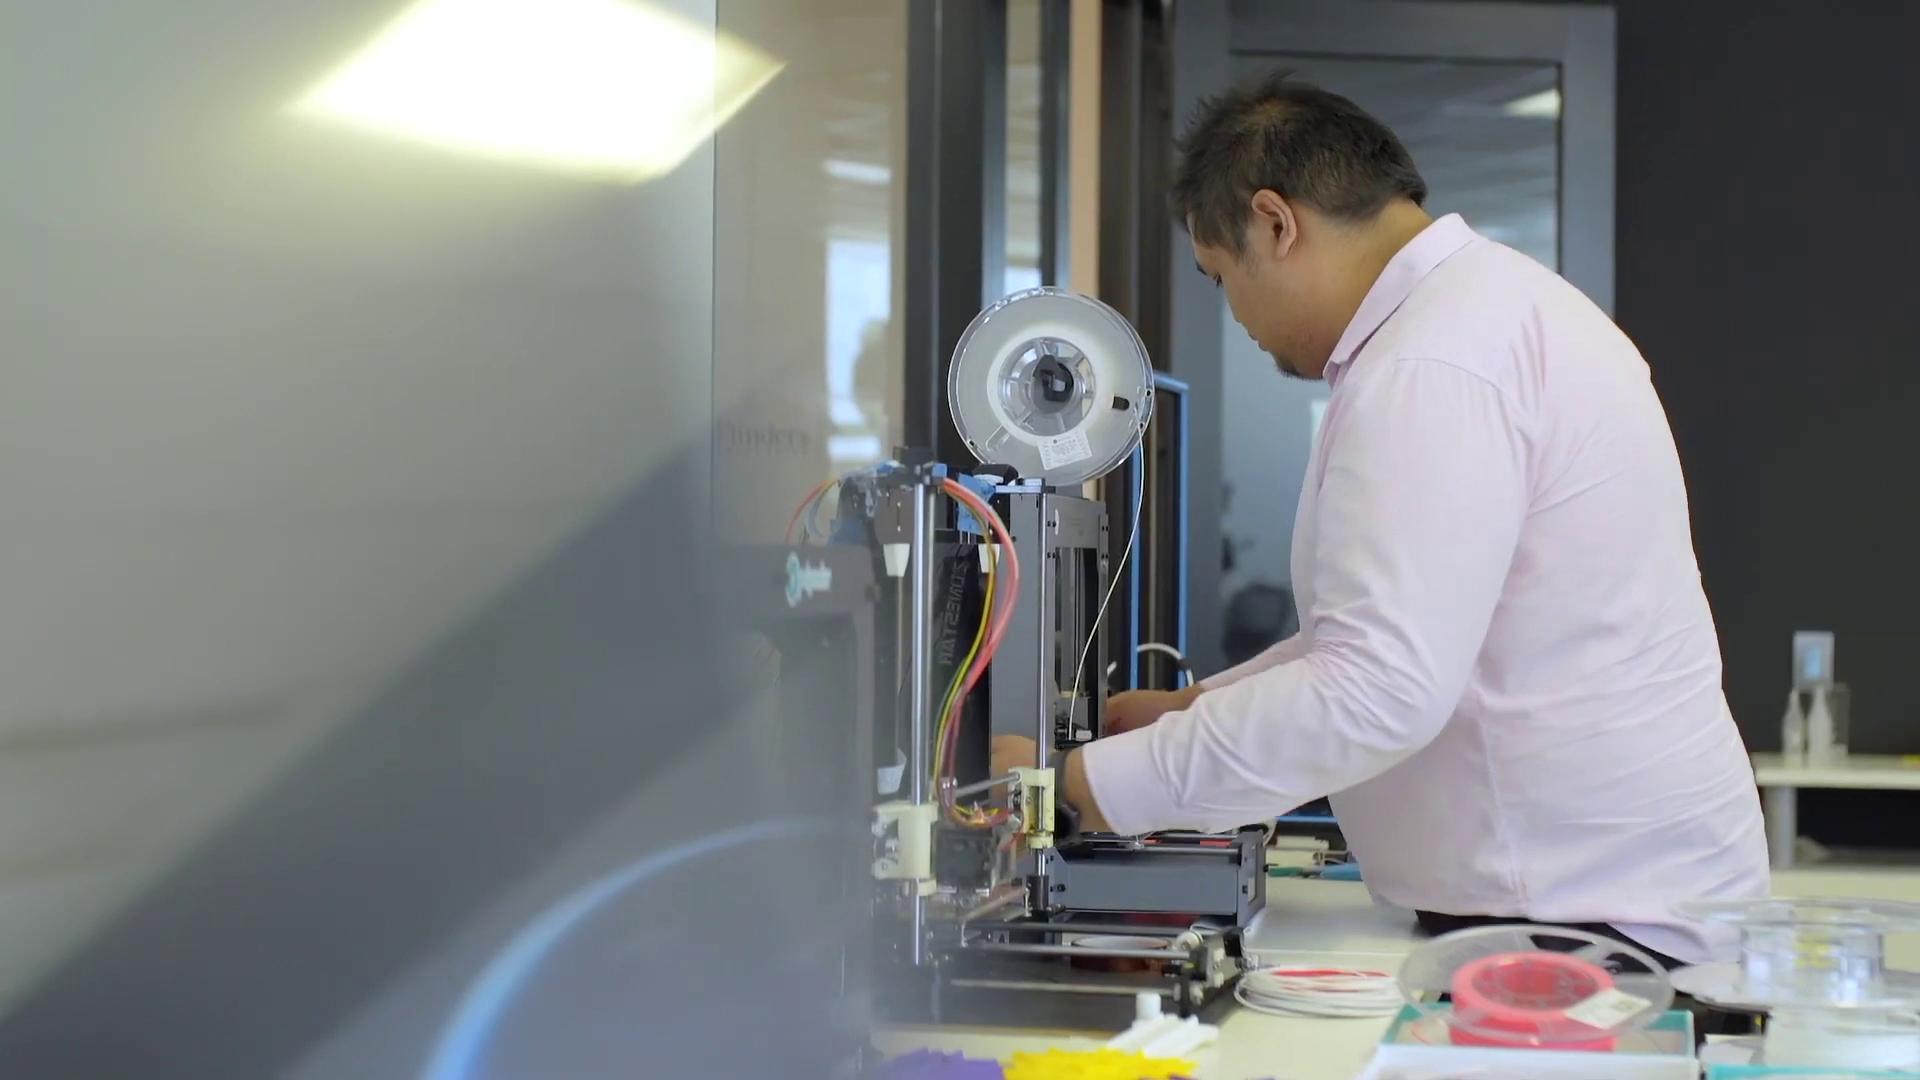 Flinders Innovation Centre's manager Raphael Garcia fine-tuning a 3D printer